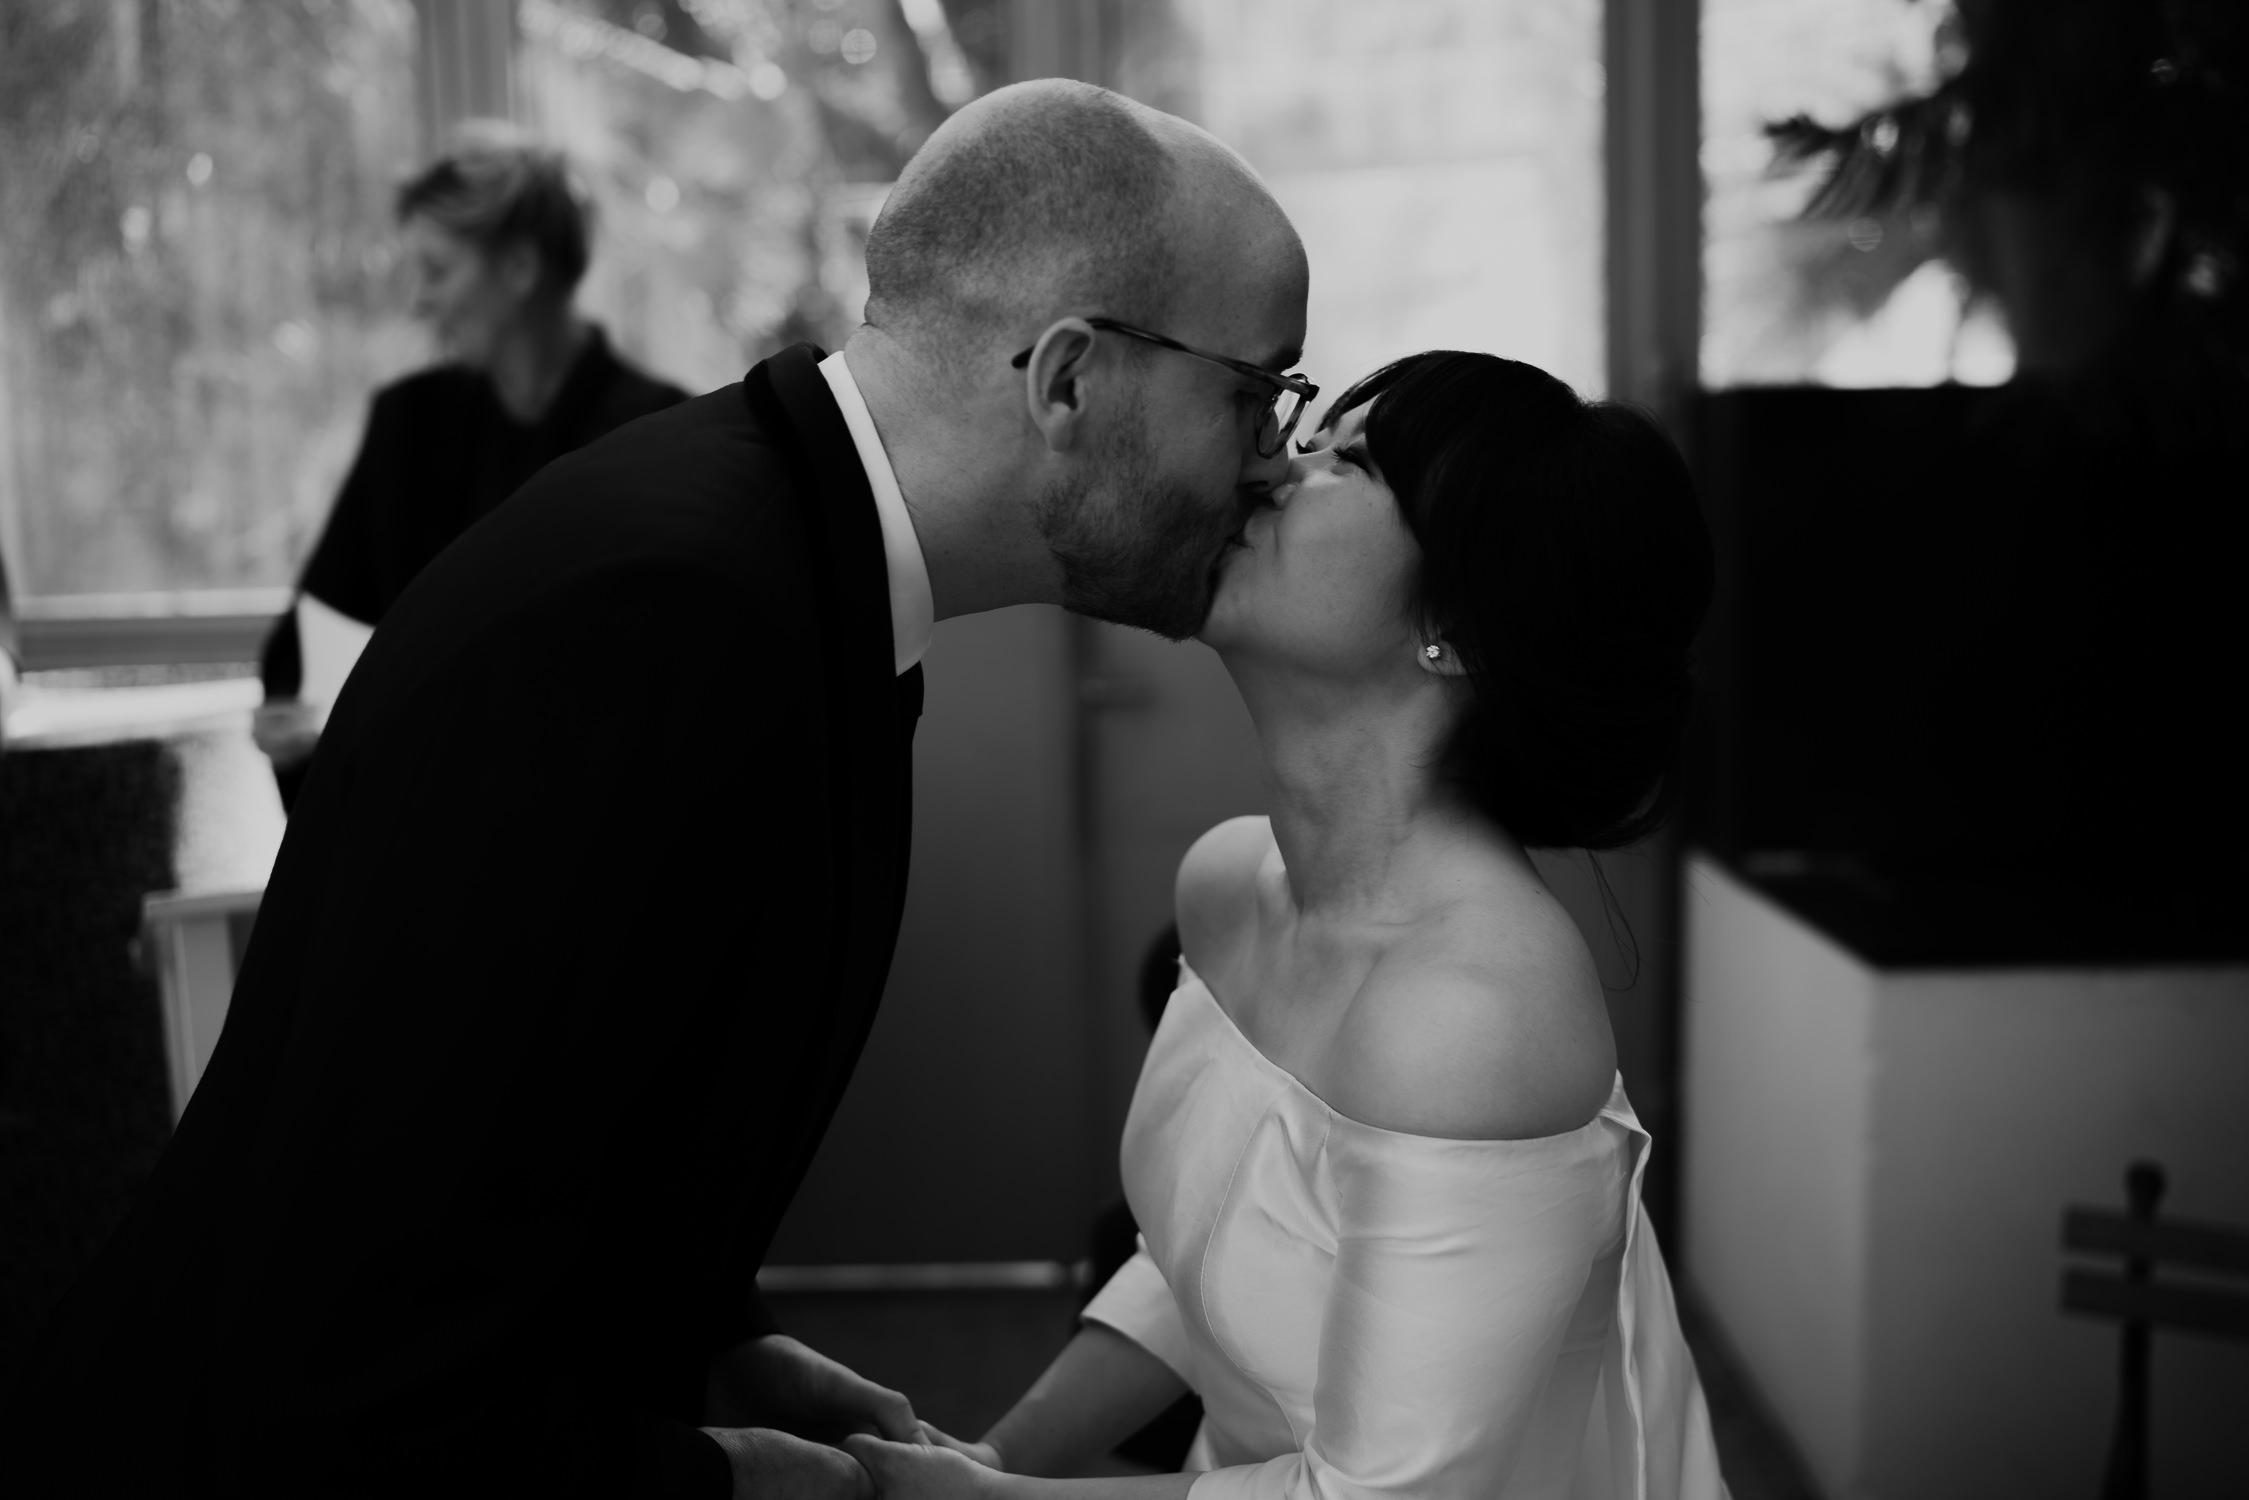 First kiss beautiful wedding ceremony in amsterdam hortus botanicus